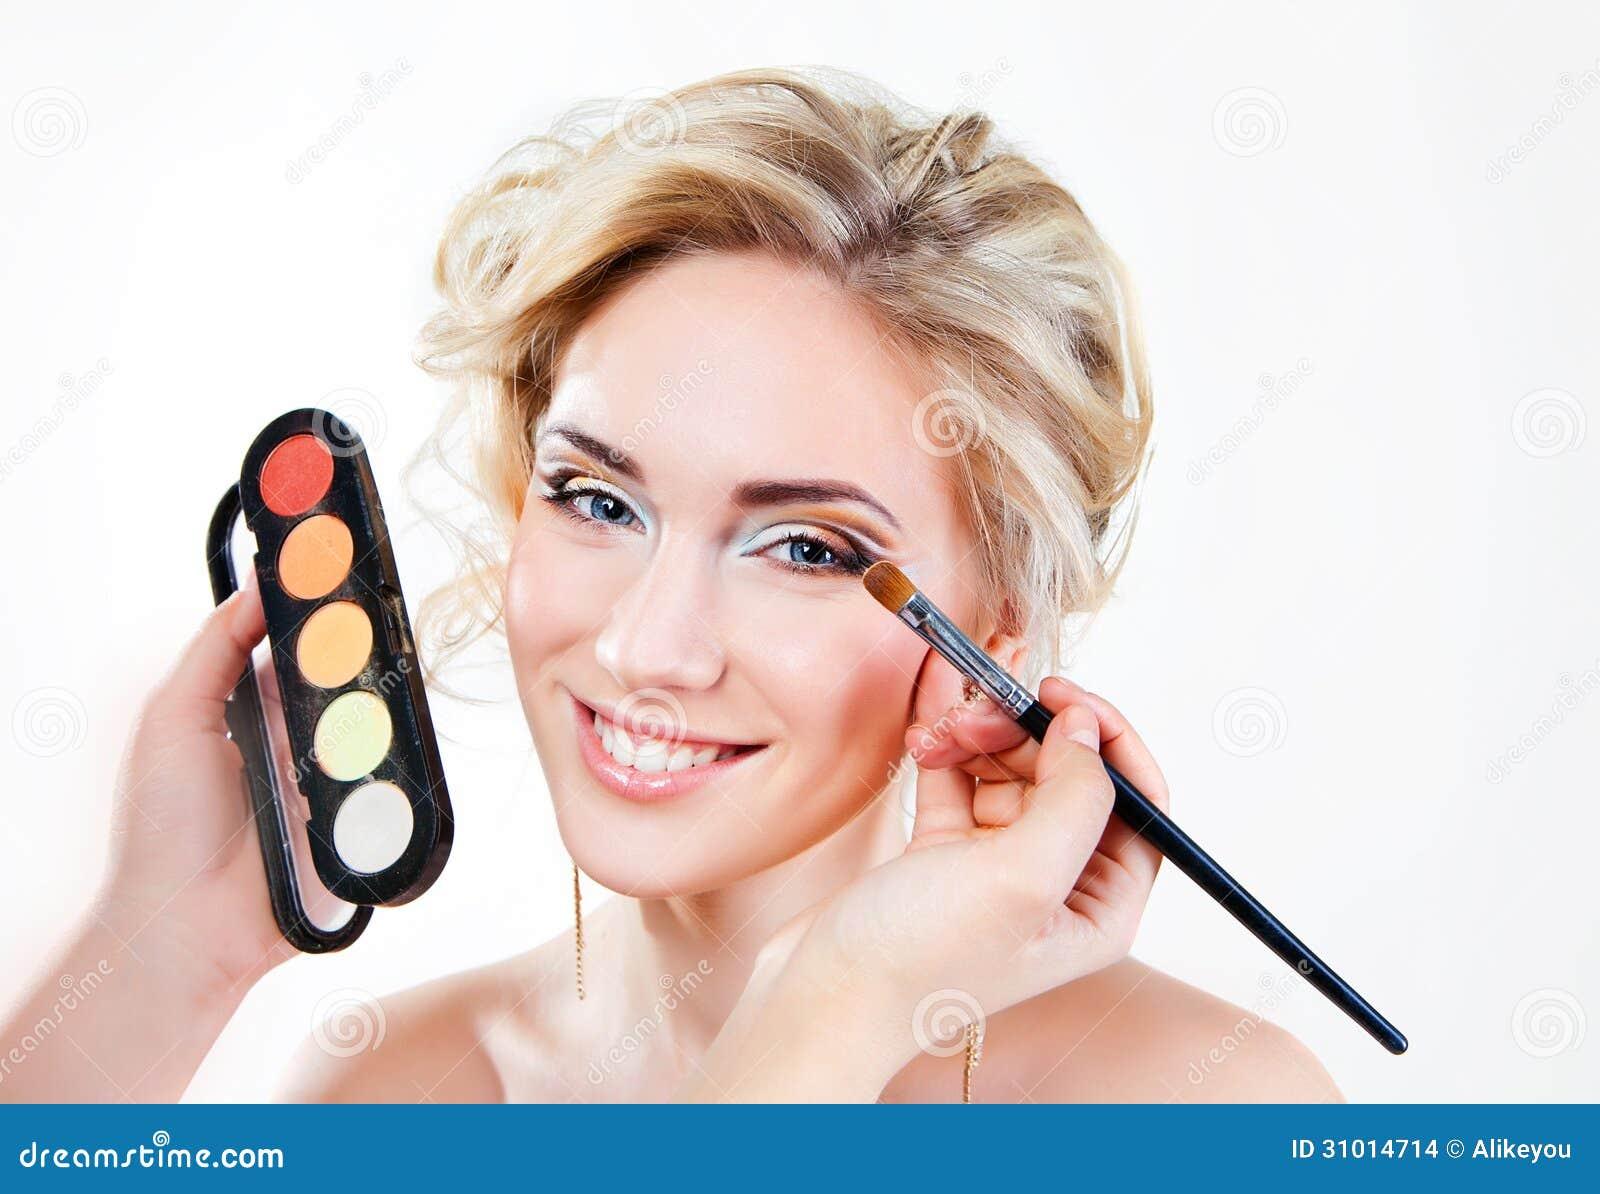 Applying Wedding Day Makeup : Applying Wedding Makeup Stock Images - Image: 31014714